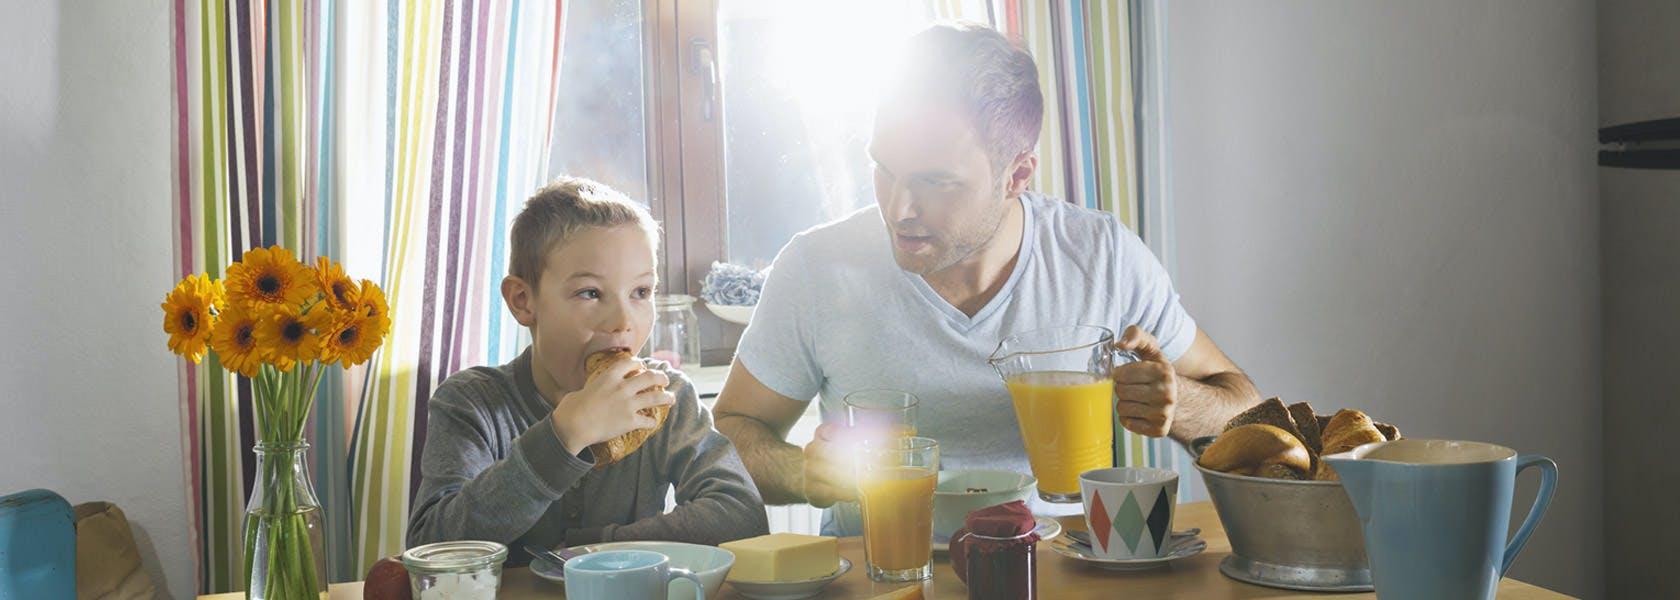 Familie spiser en sund morgenmad sammen